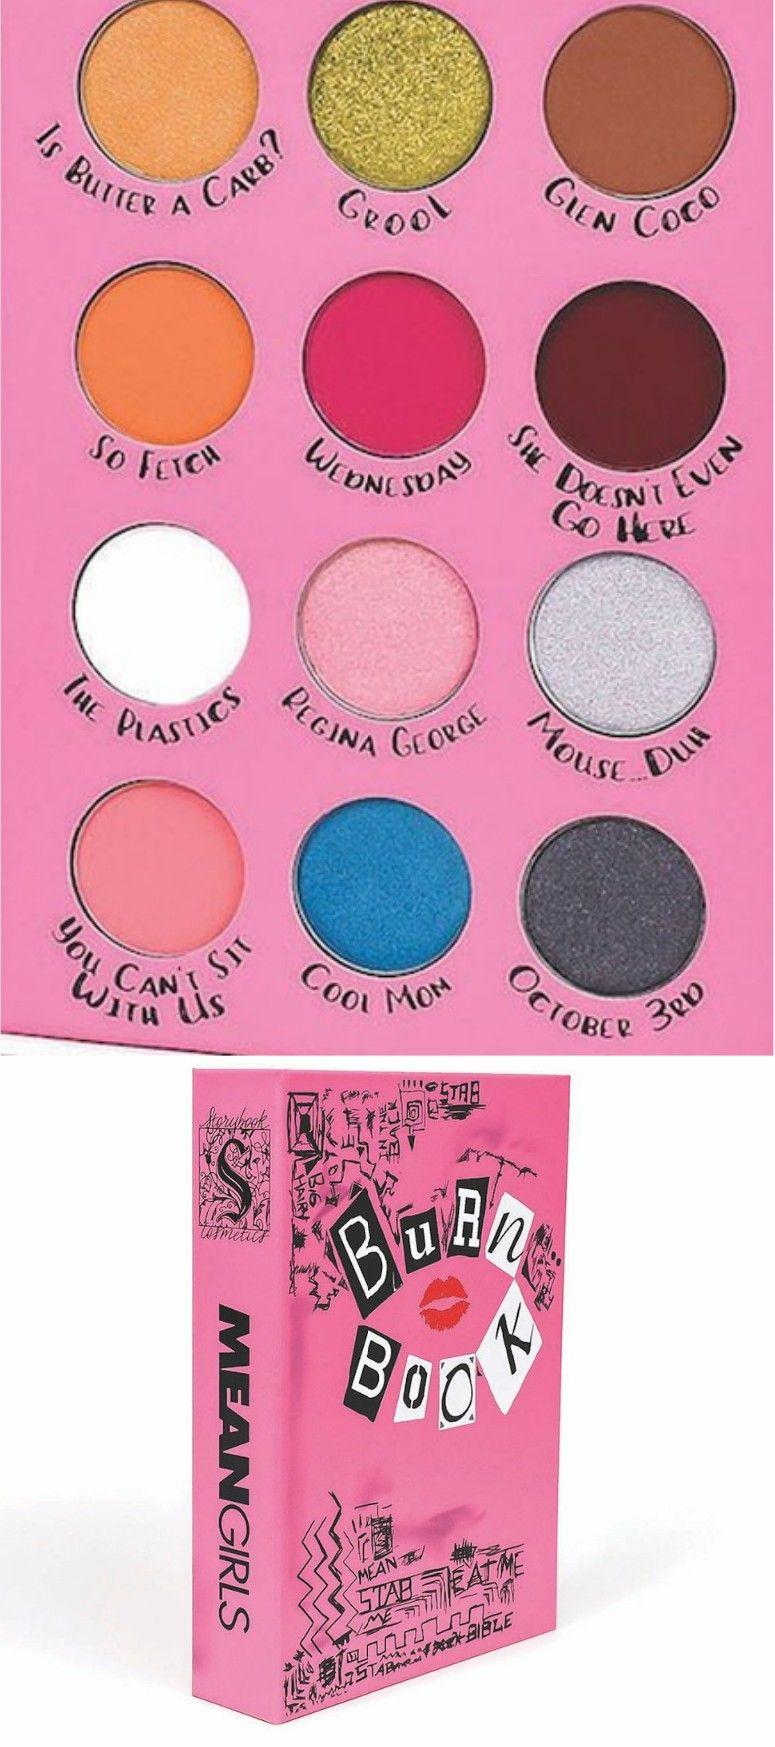 Mean Girls Burn Book Storybook Palette Mean Girls Burn Book Storybook Cosmetics Mean Girls Makeup